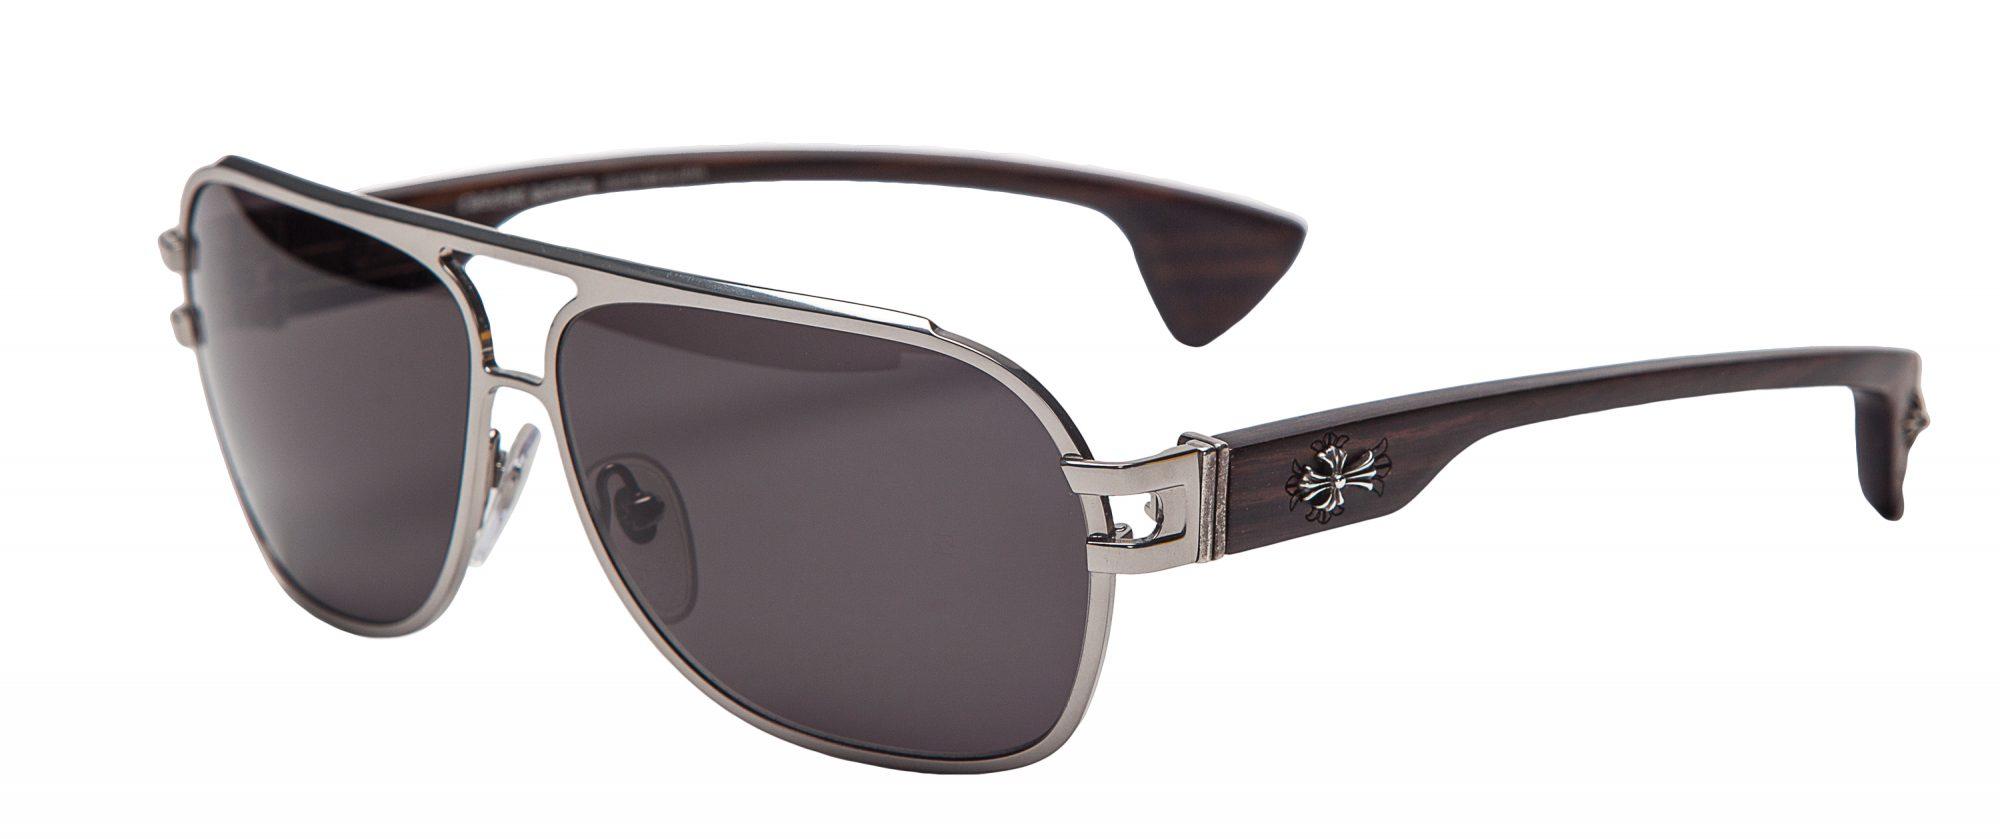 FOR-WEB_cool-hunters-4-glasses